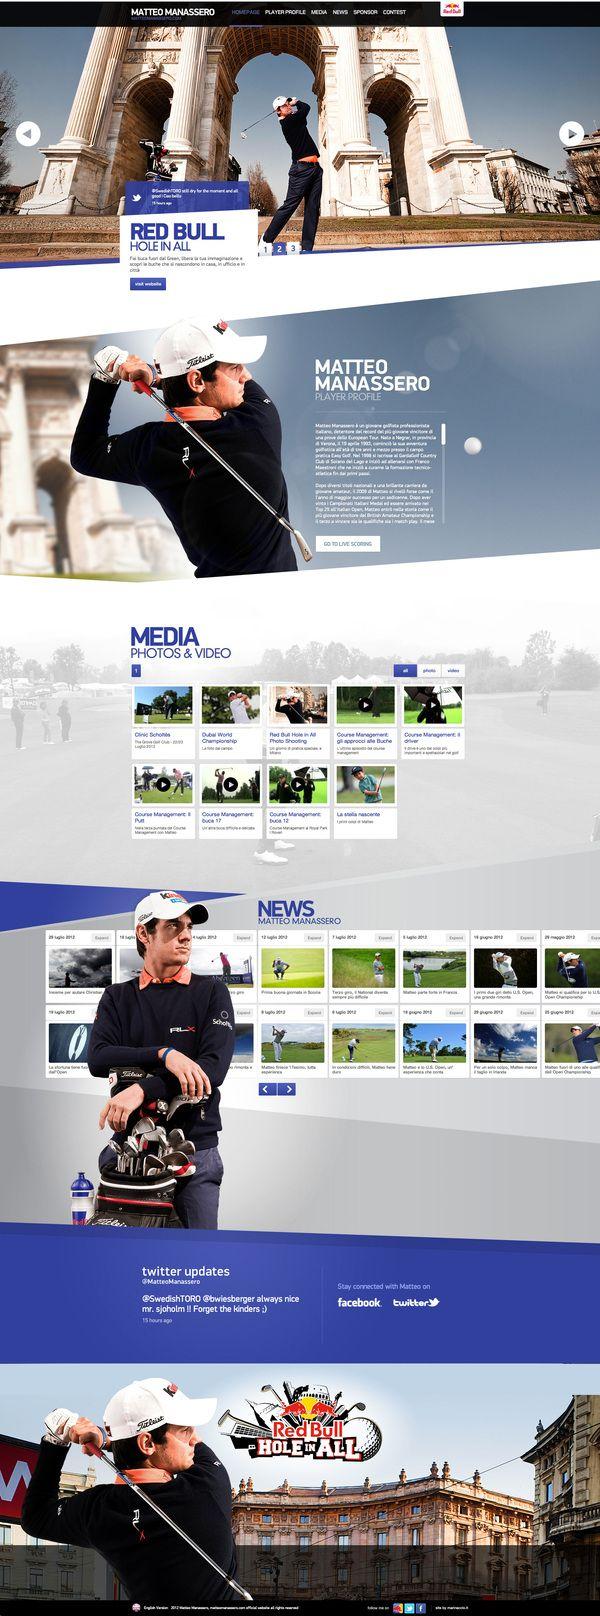 Matteo Manassero Official Website by Danilo Marinaccio, via Behance